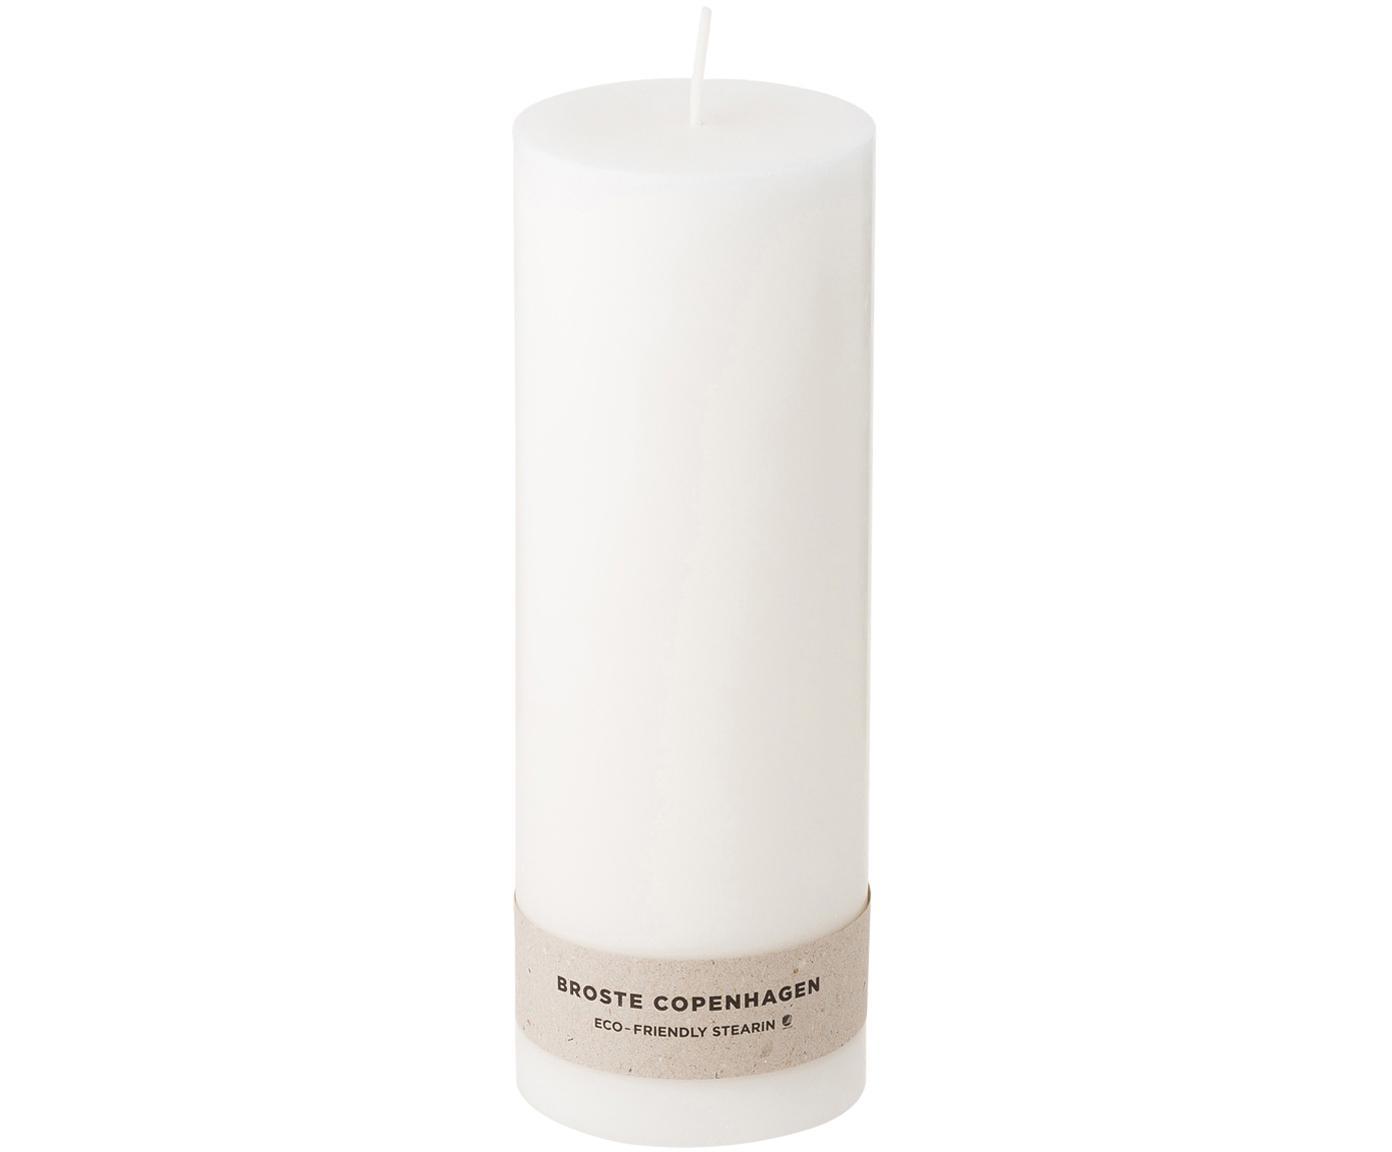 Stompkaarsen Light, 2 stuks, 100% Stearine, Wit, Ø 7 x H 20 cm